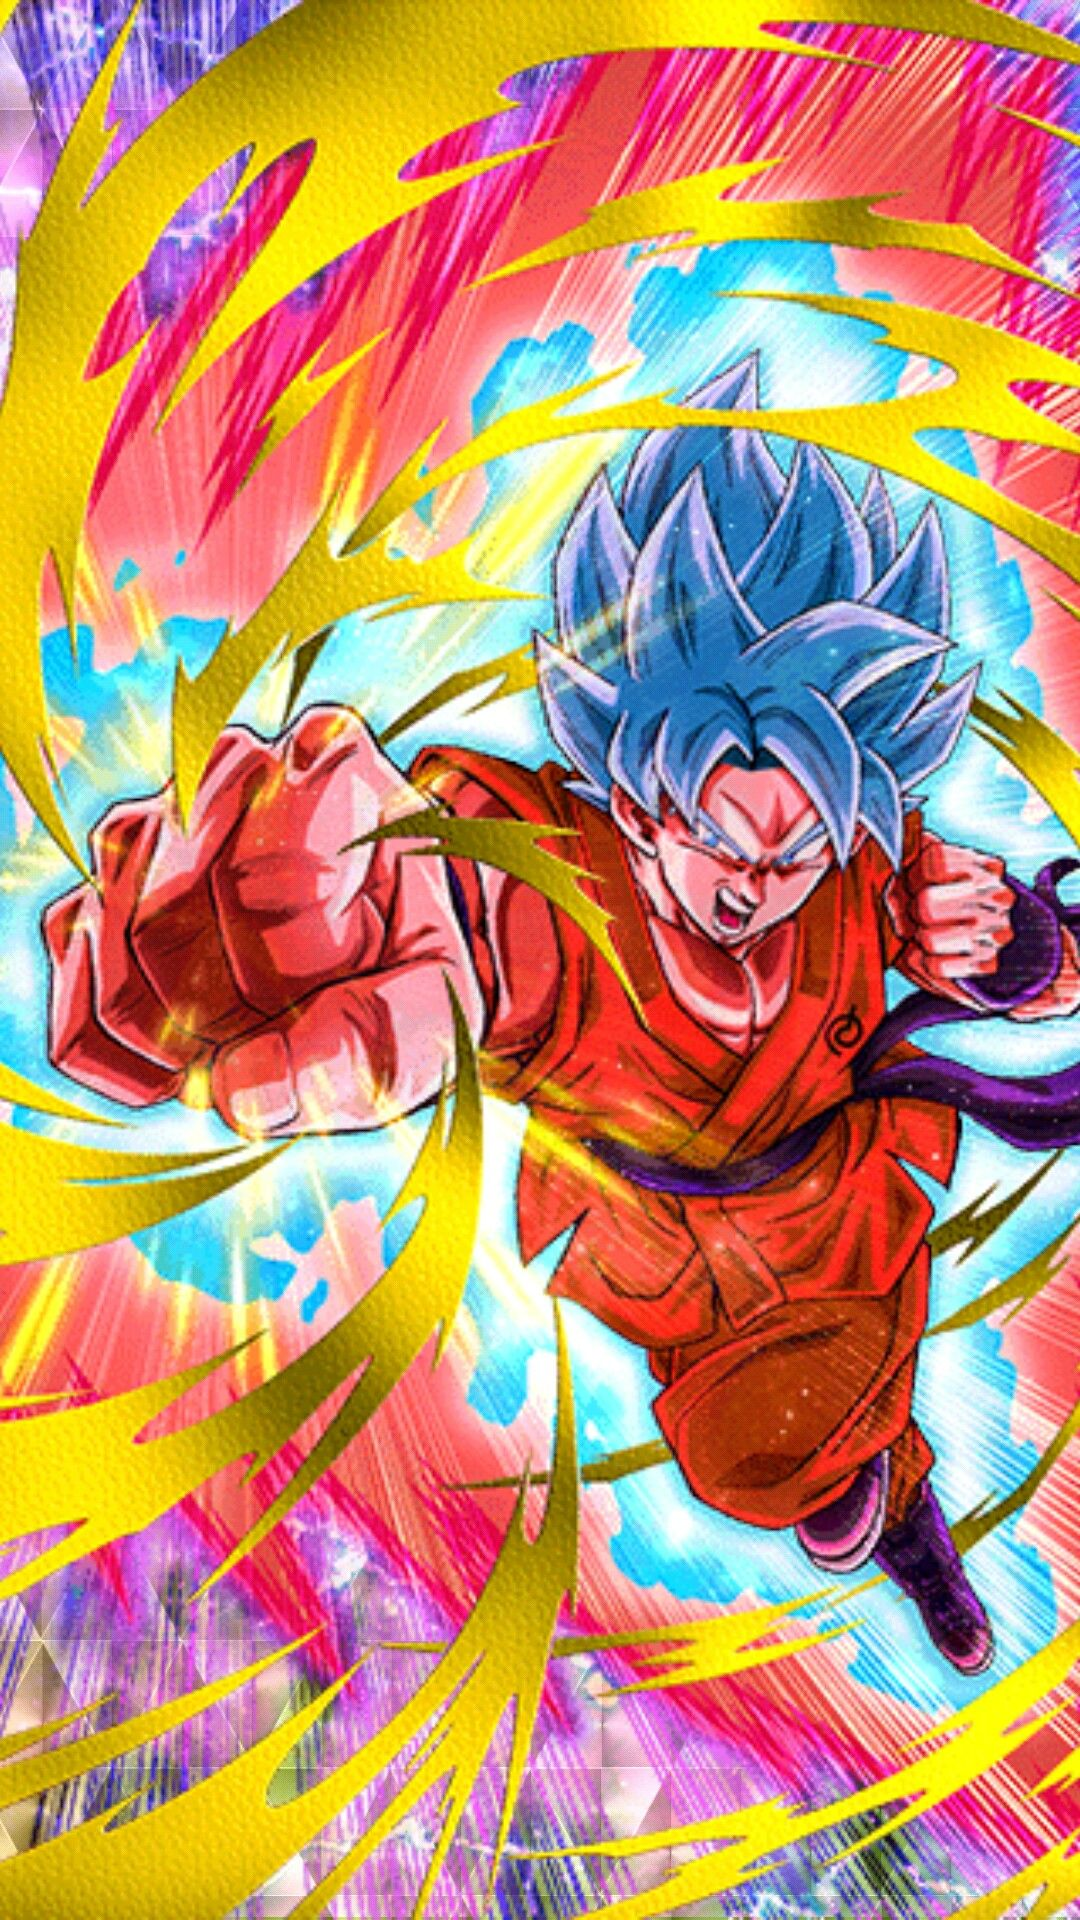 Super Sayian Blue Goku Kaioken X10 Dragones Personajes De Dragon Ball Personajes De Goku